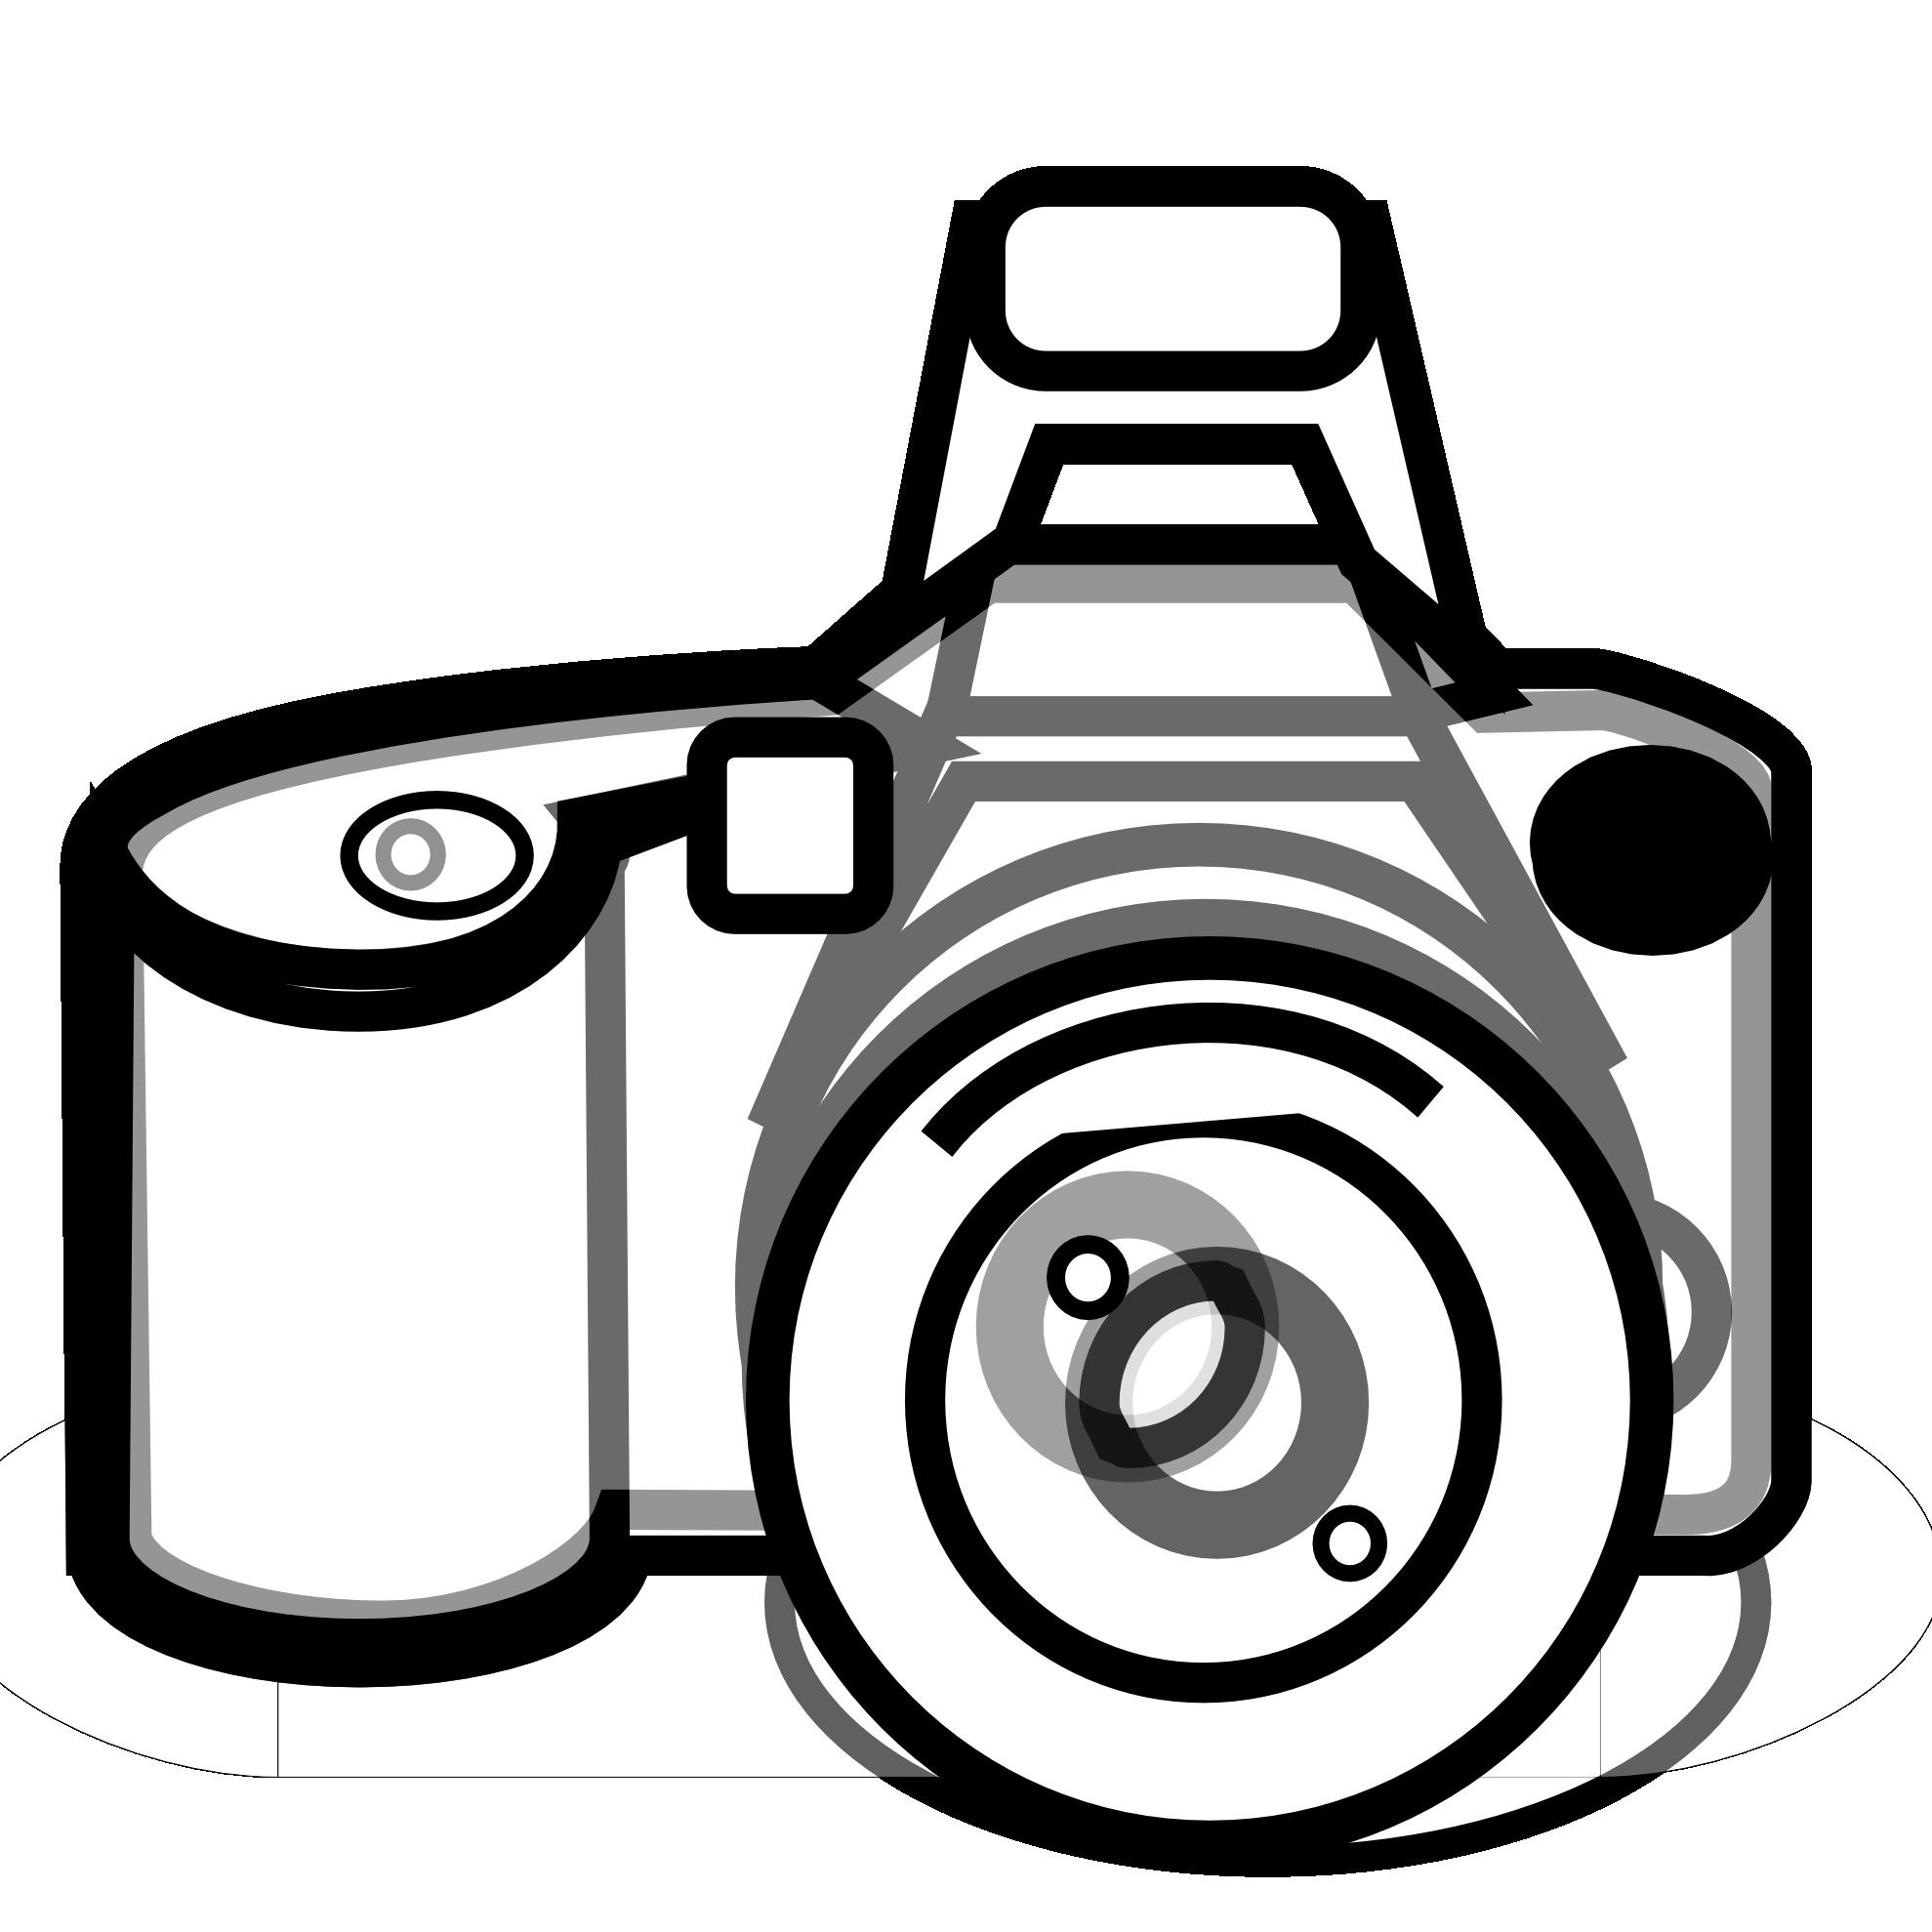 free clipart slr camera - photo #37